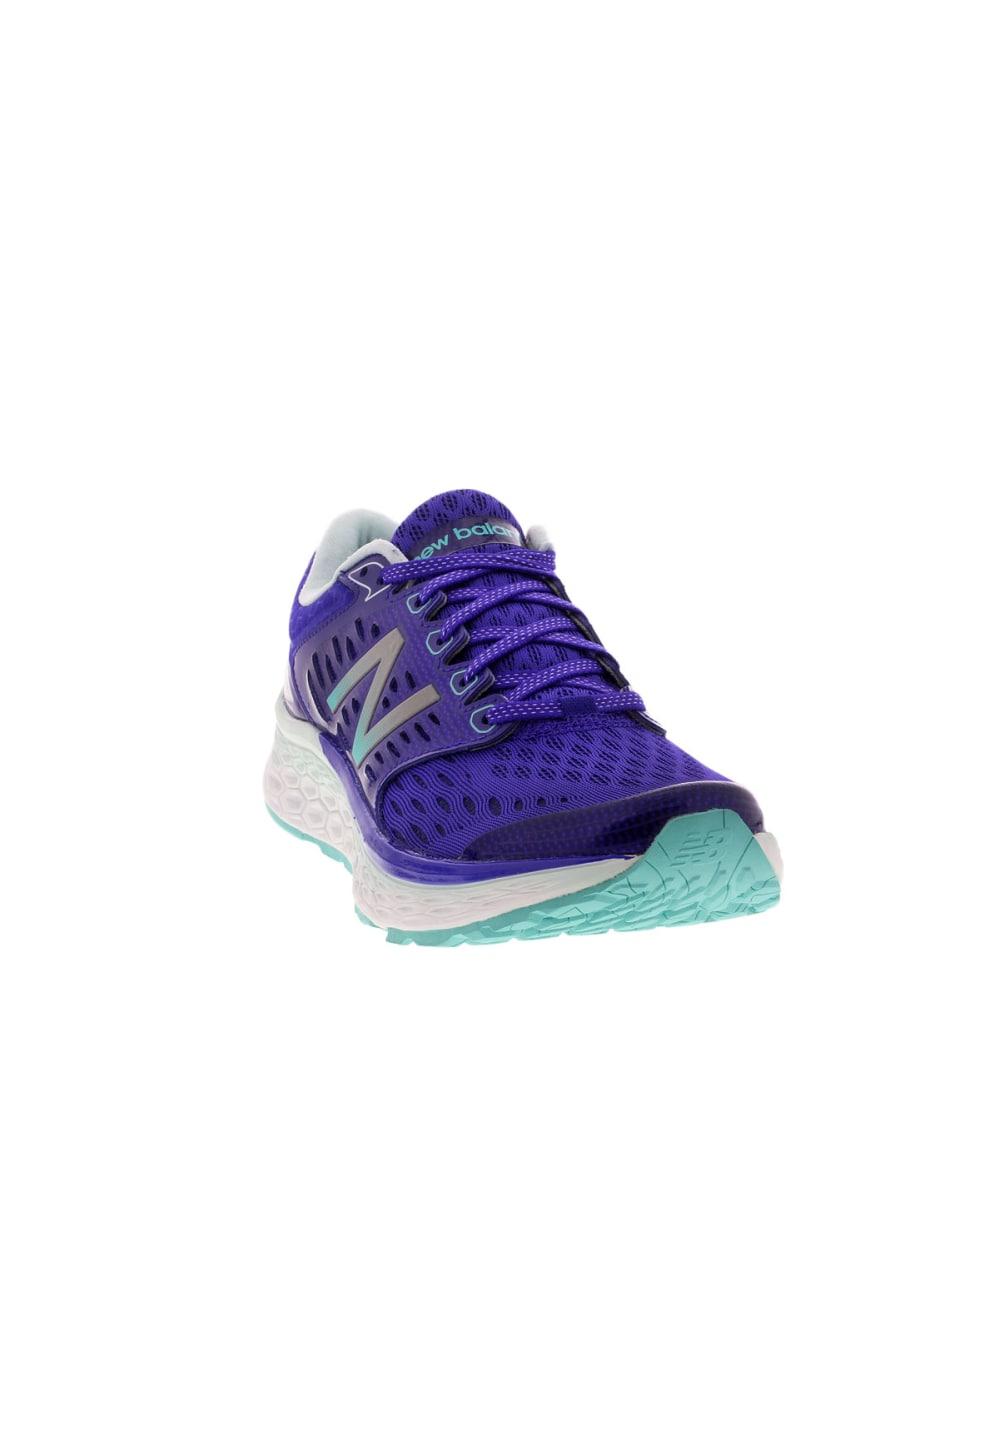 New Balance FreshFoam 1080 V6 Chaussures running pour Femme Violet